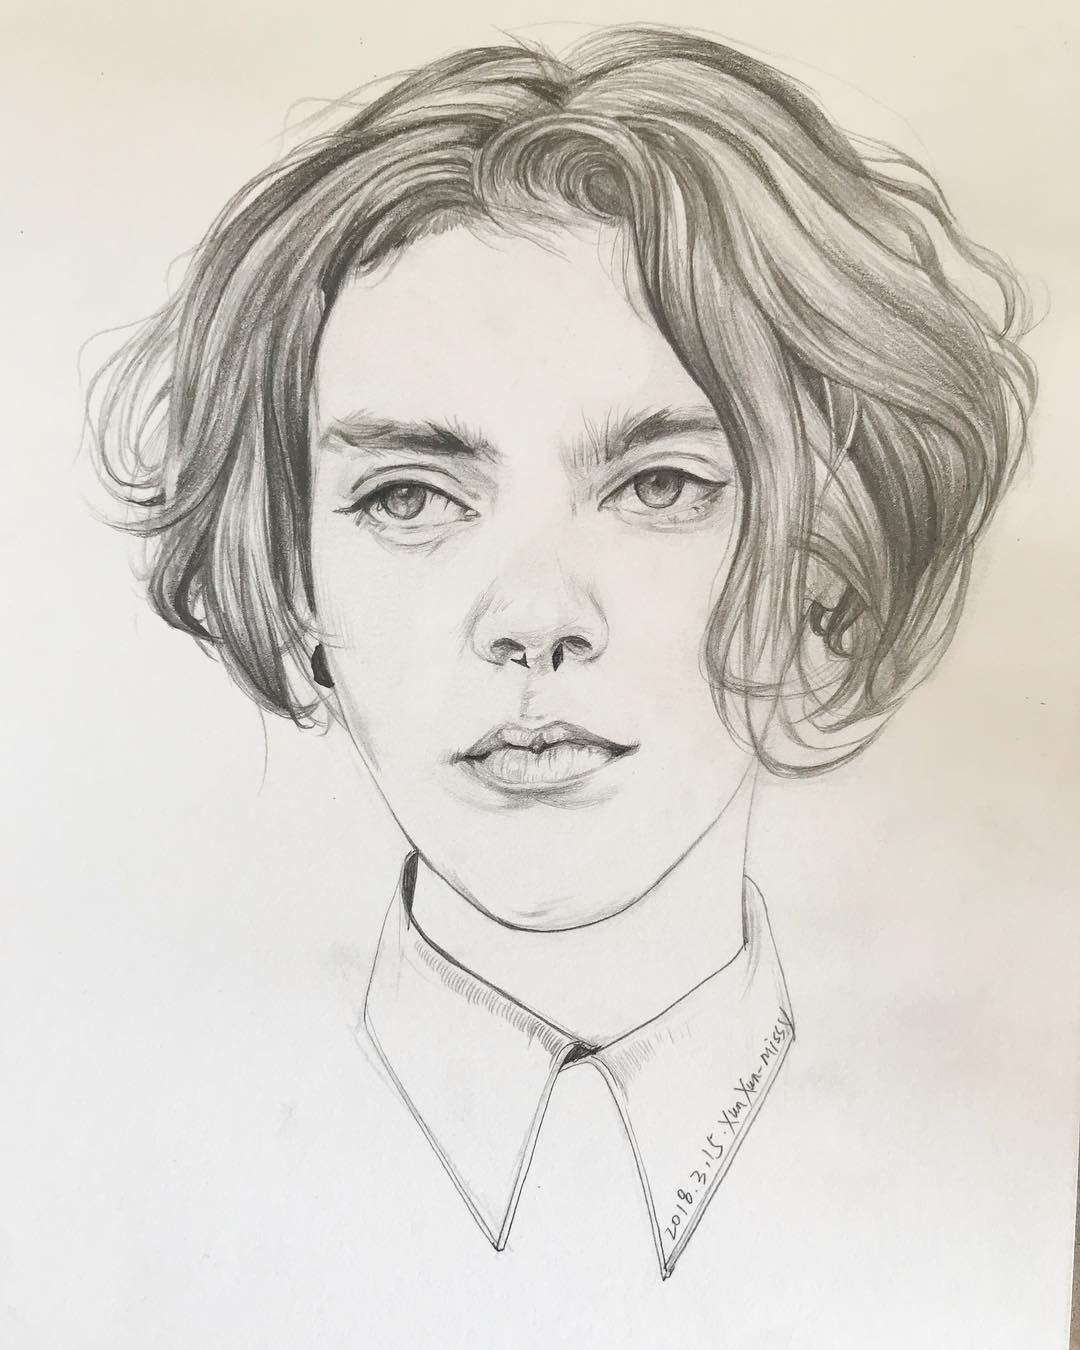 Boy art artwork illustration pencil illustrator boy fashion fashionmodel sketch sketches sketchbook draw drawing sketching doodle